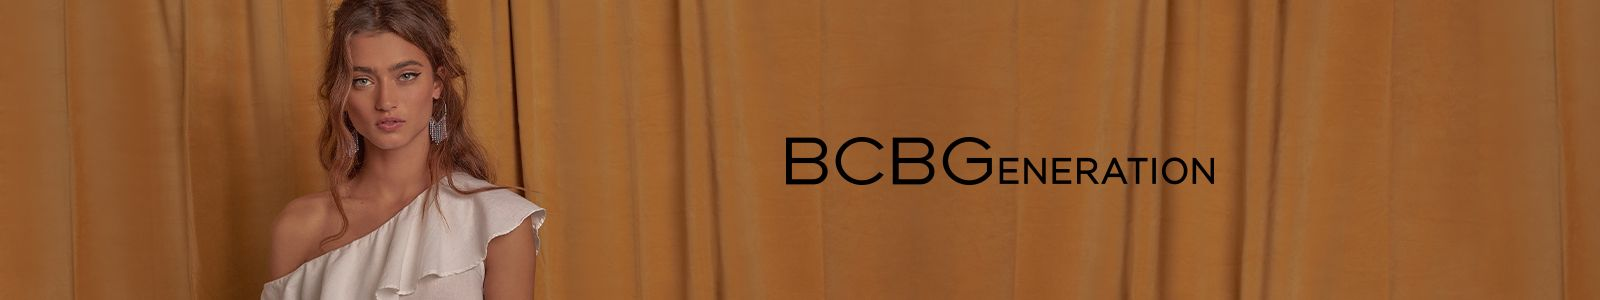 BCB Generation, Shop Now